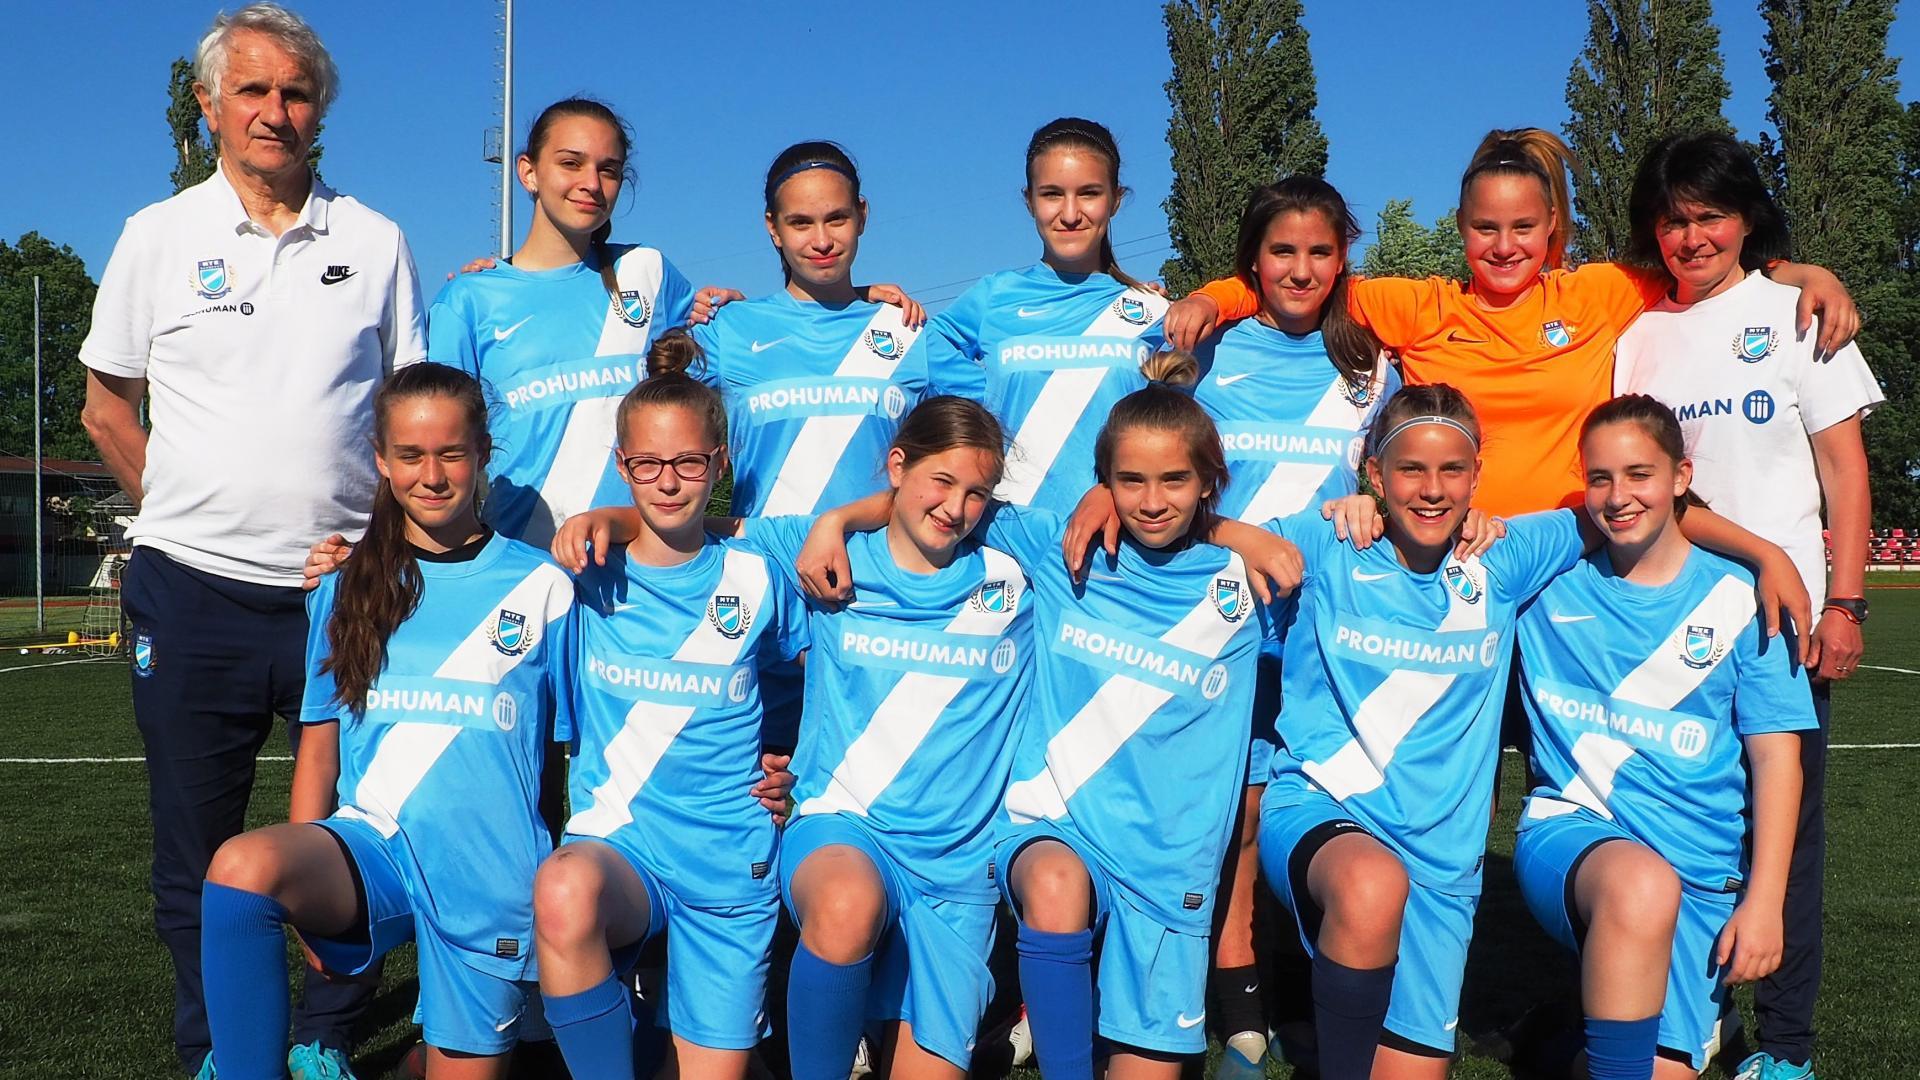 Bajnok lett U14-es csapatunk